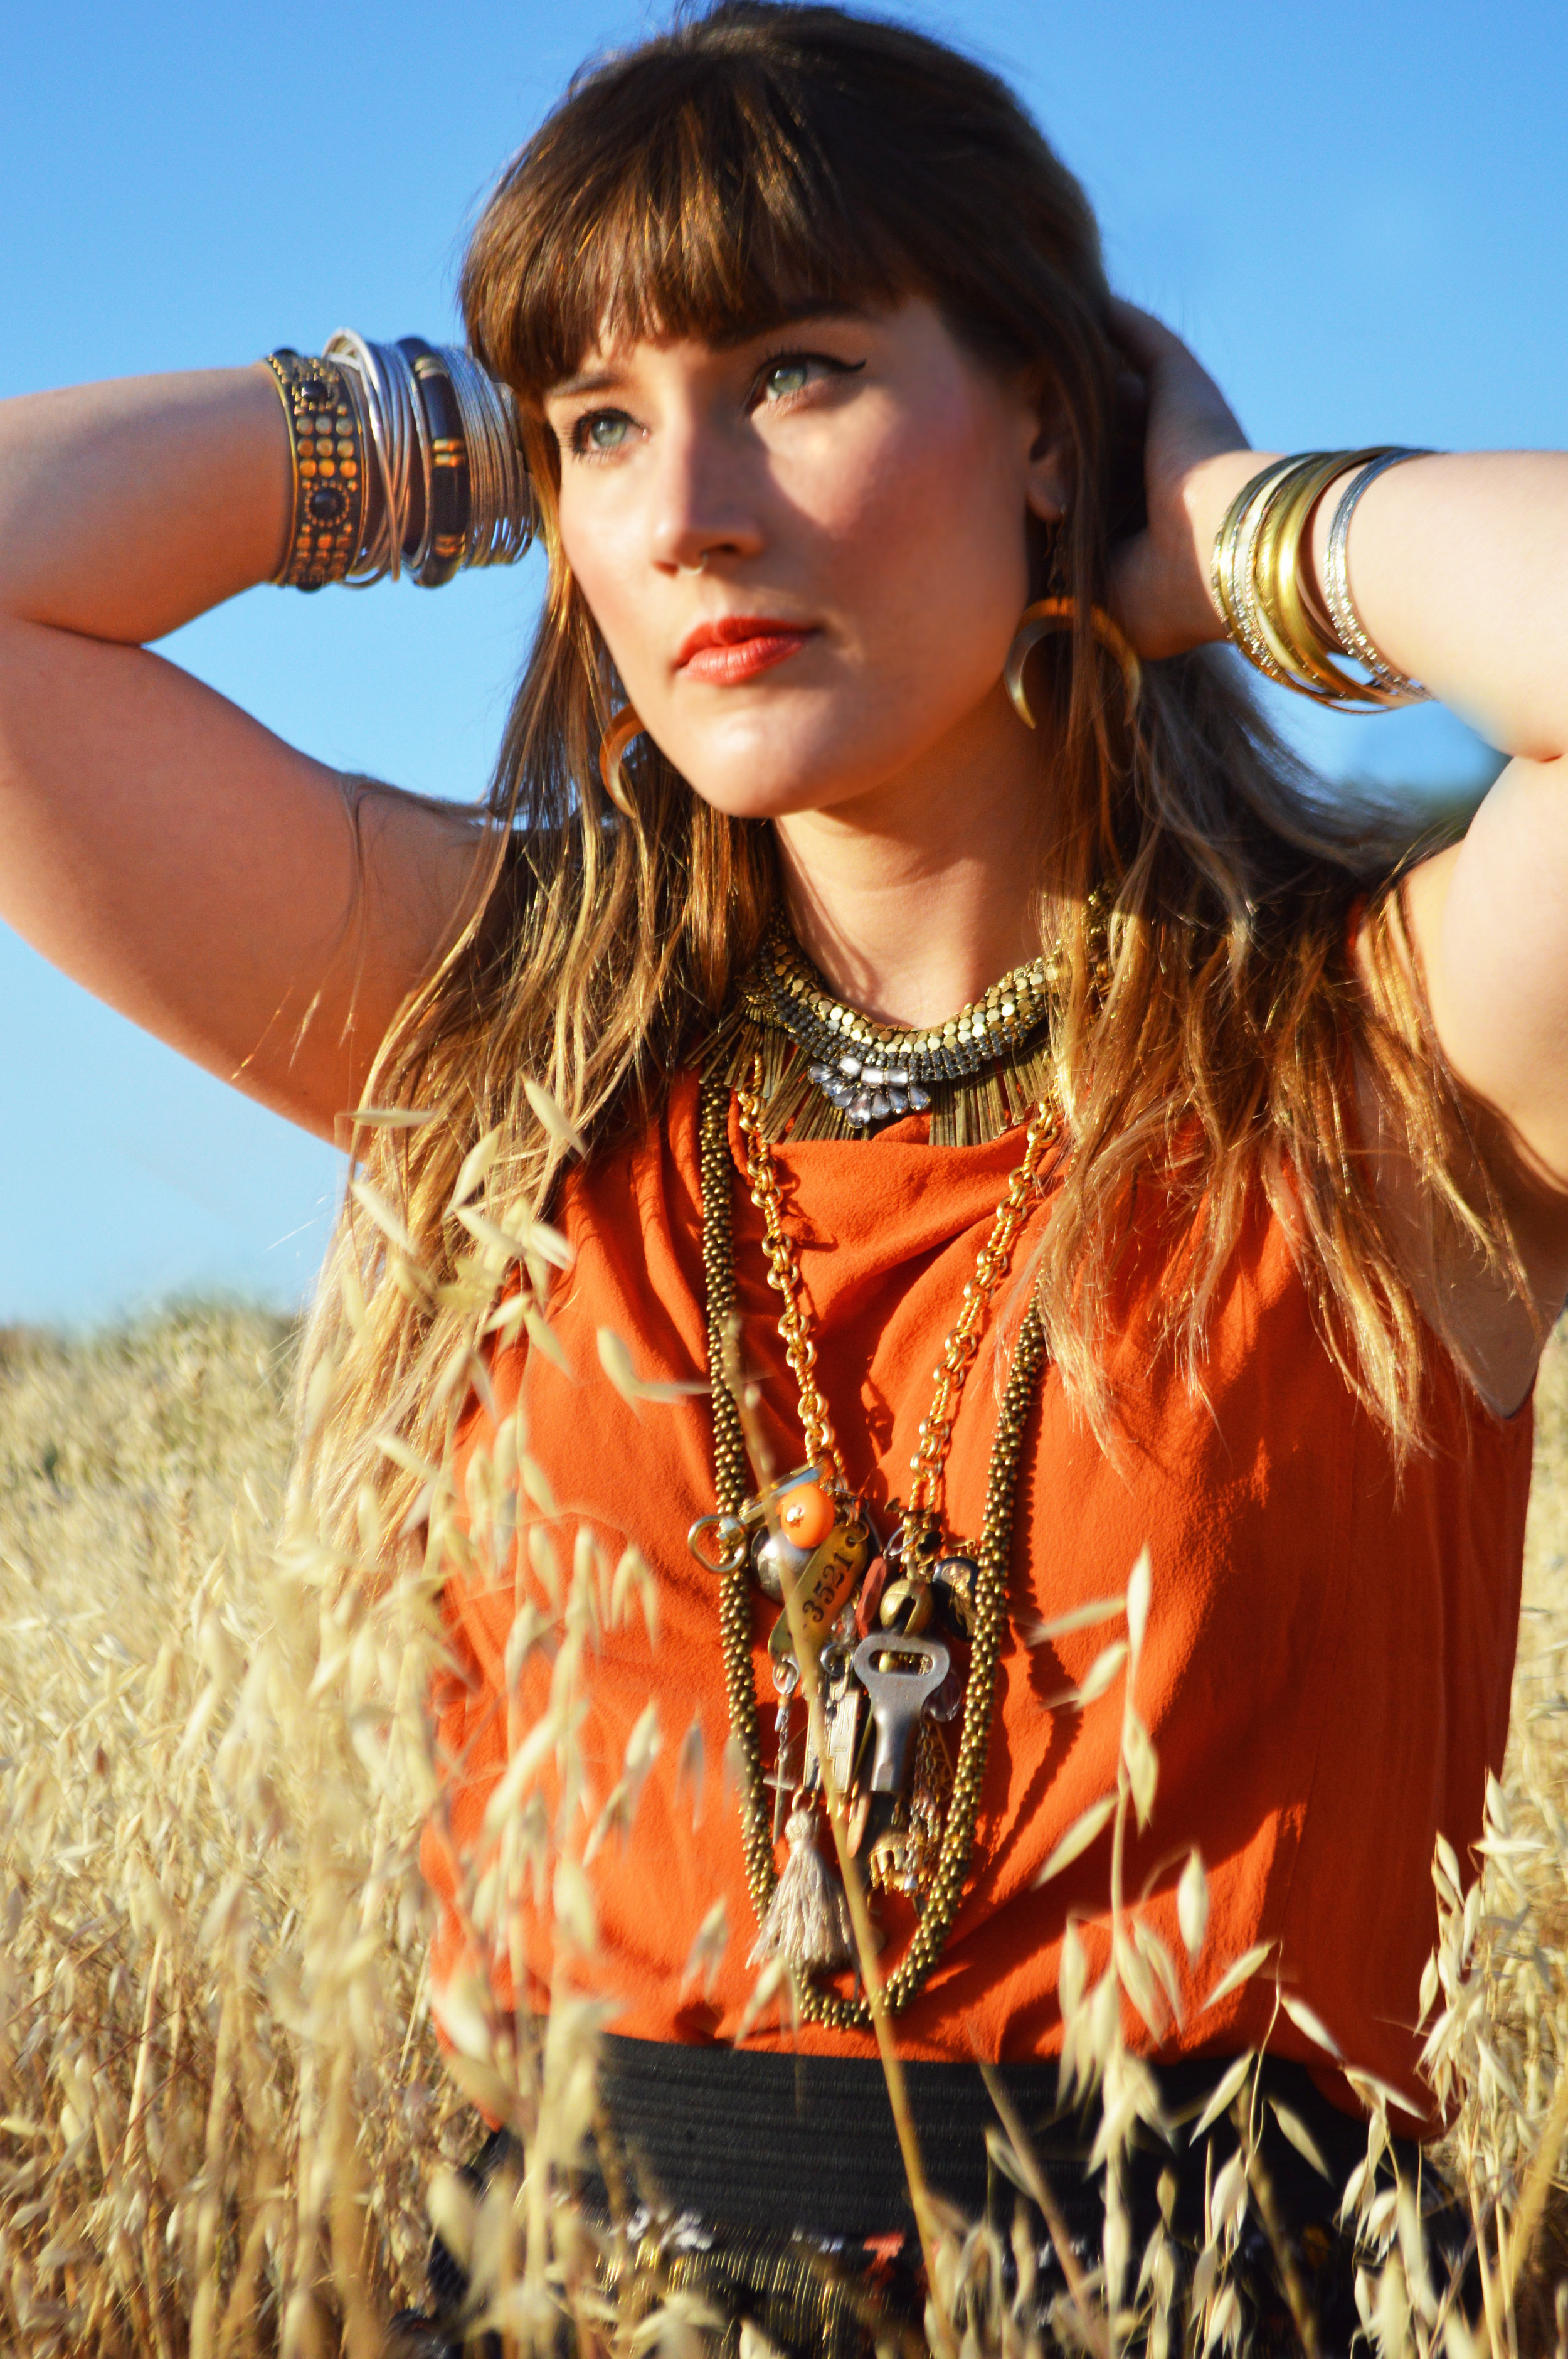 Fashion Model Bracelets Jewelry | Fashion Photography | Lacey O